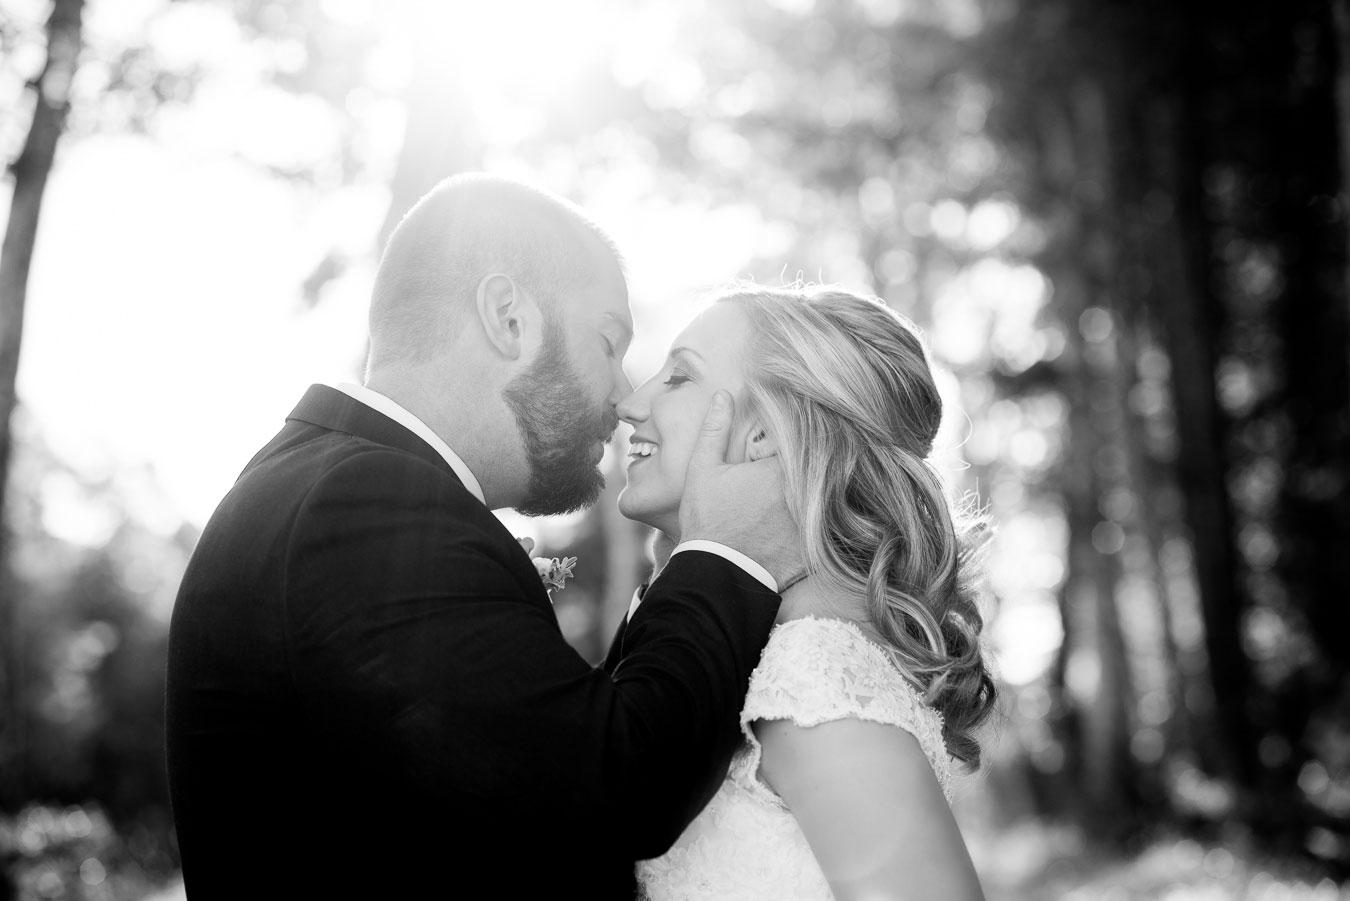 Williamsport-wedding-photographers (2).jpg